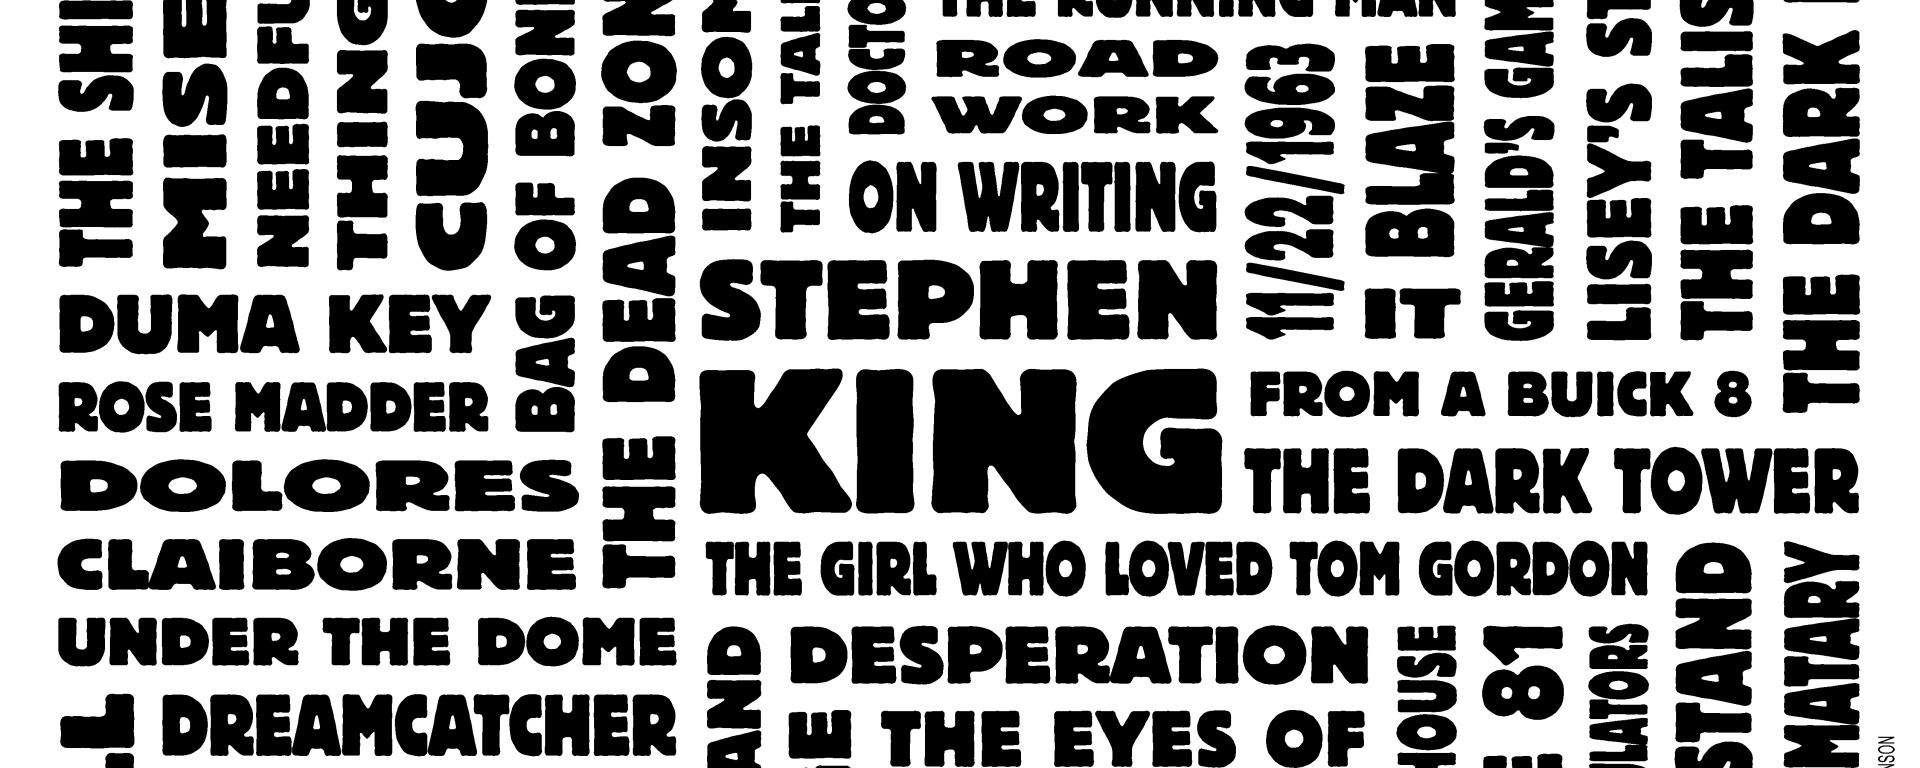 Stephen King Poster